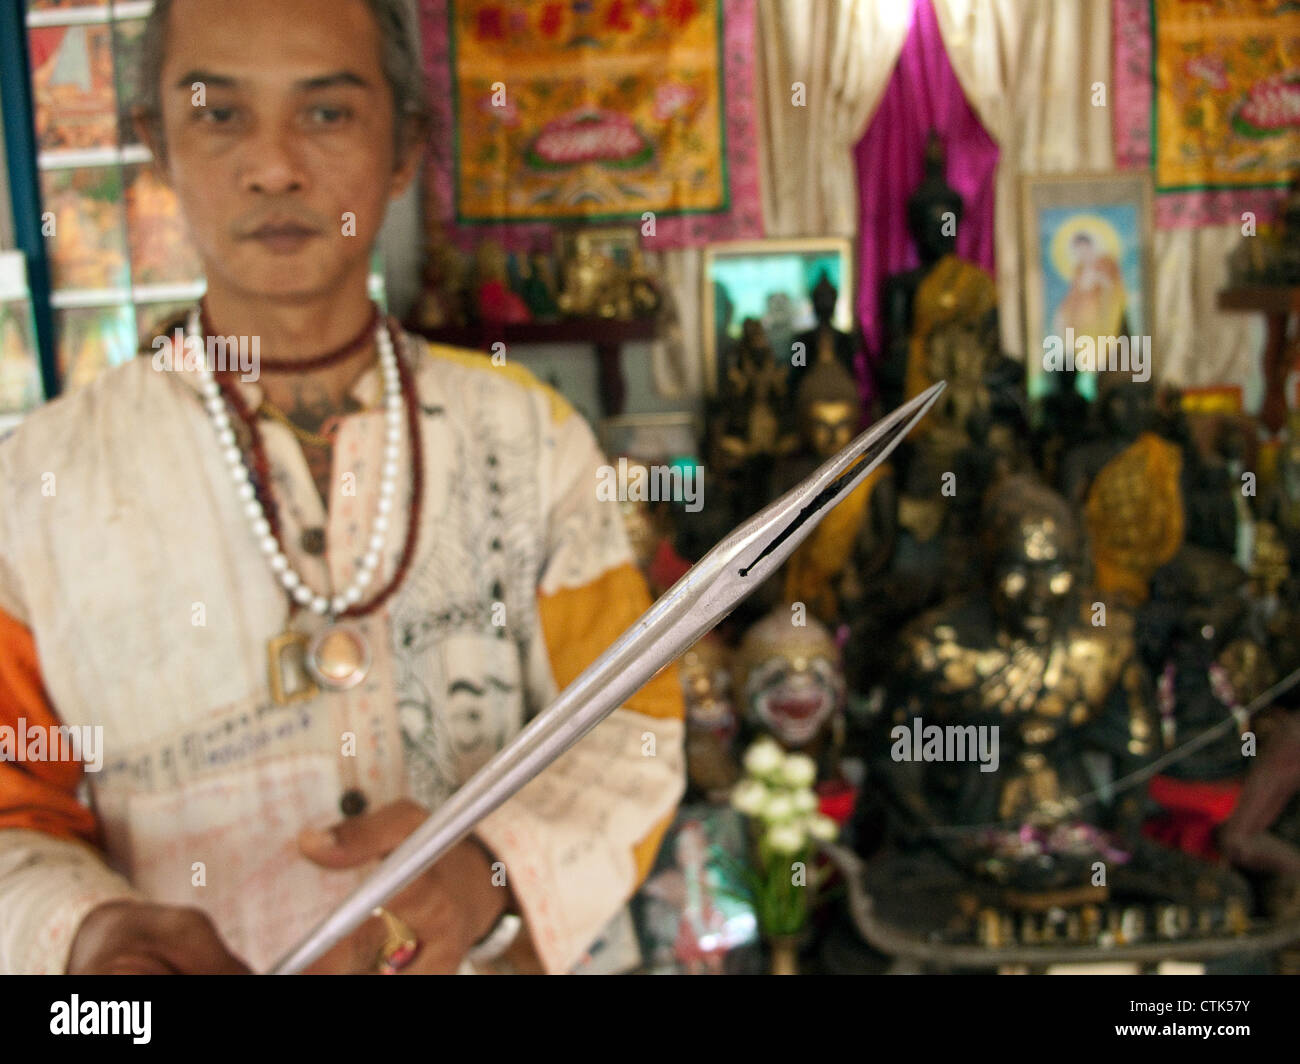 Sak Yan master, Ajahn Montree of Kalasin in the North East of Thailand. Sak Yan are the mystical tattoos popular - Stock Image